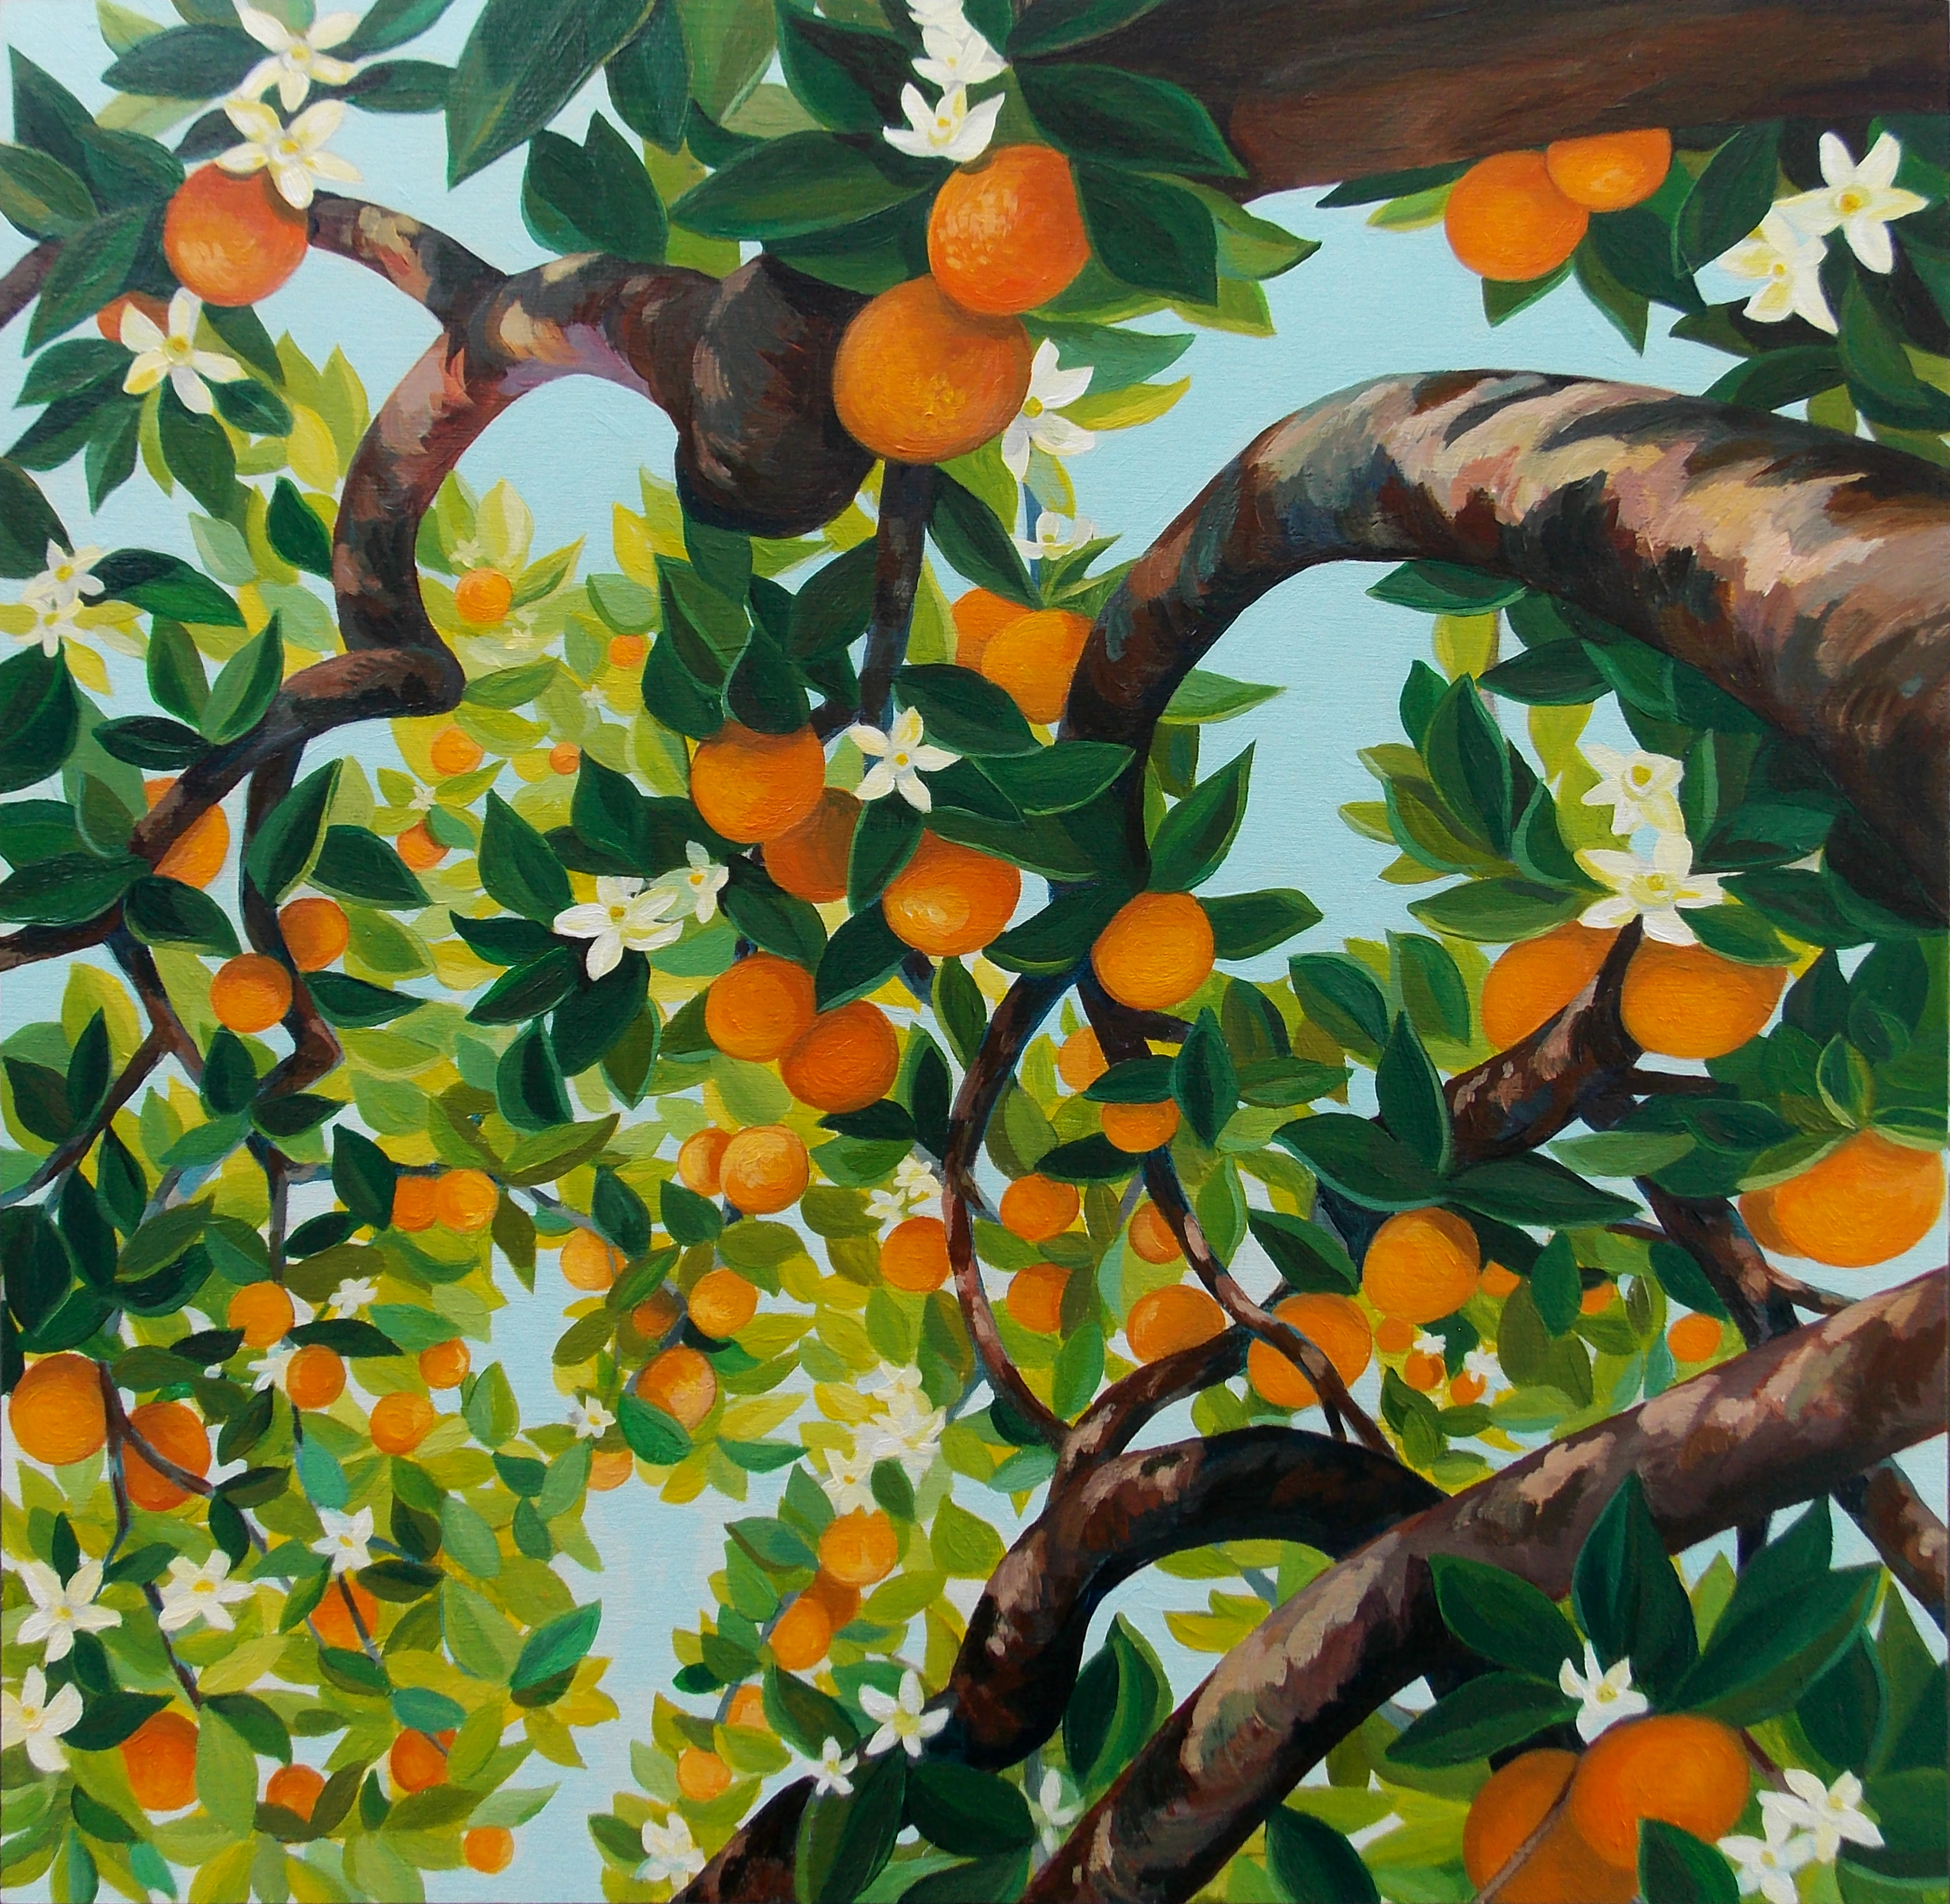 Abundance Canopy